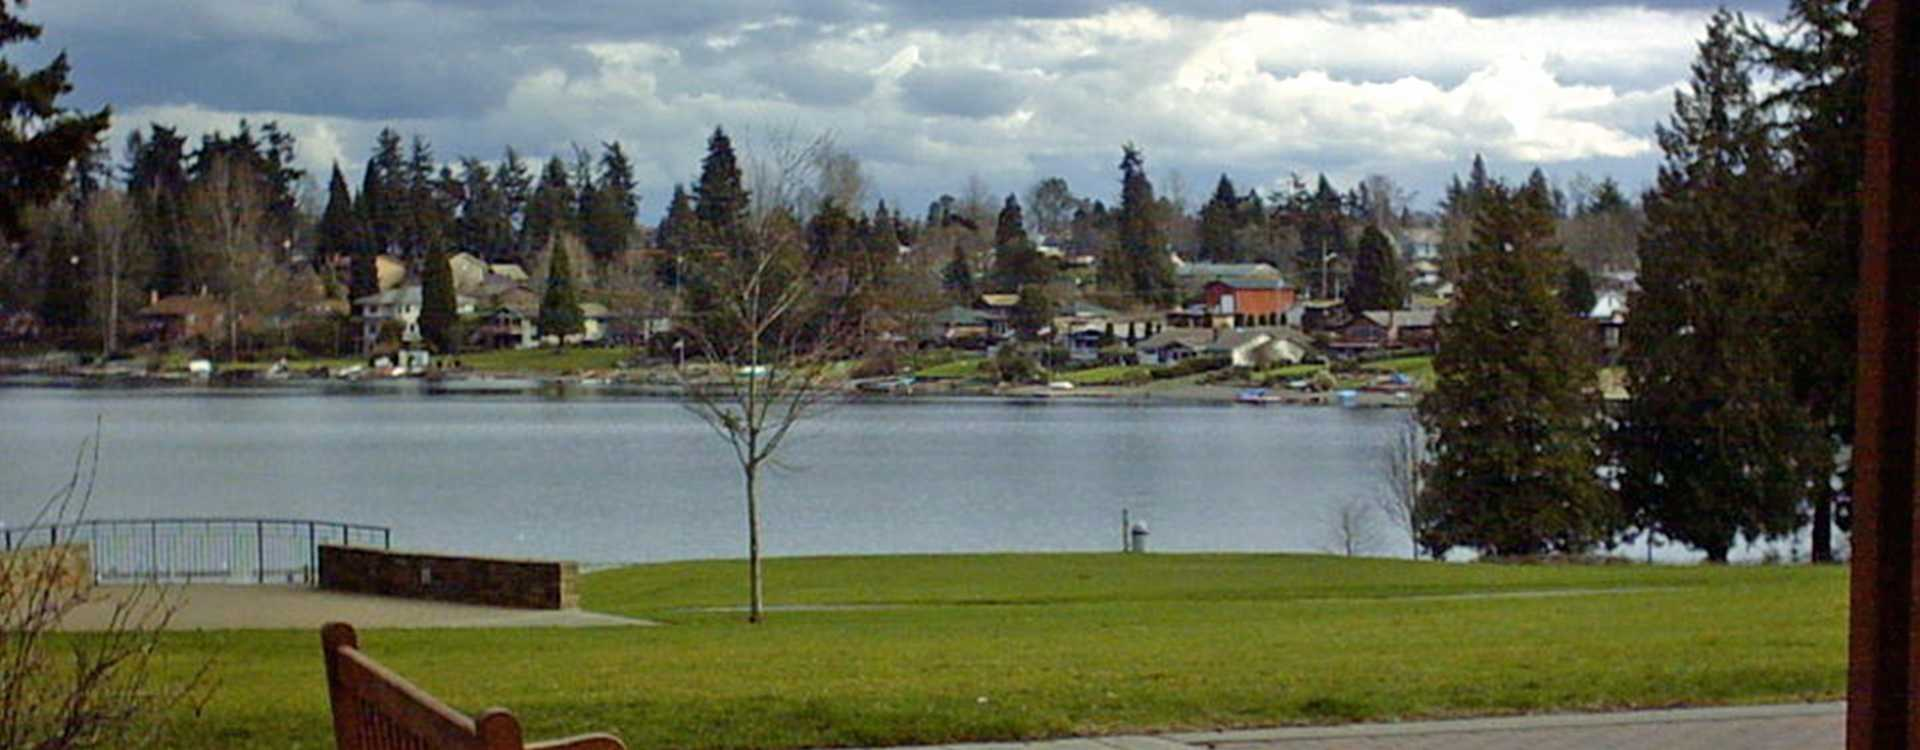 Bench and Lake